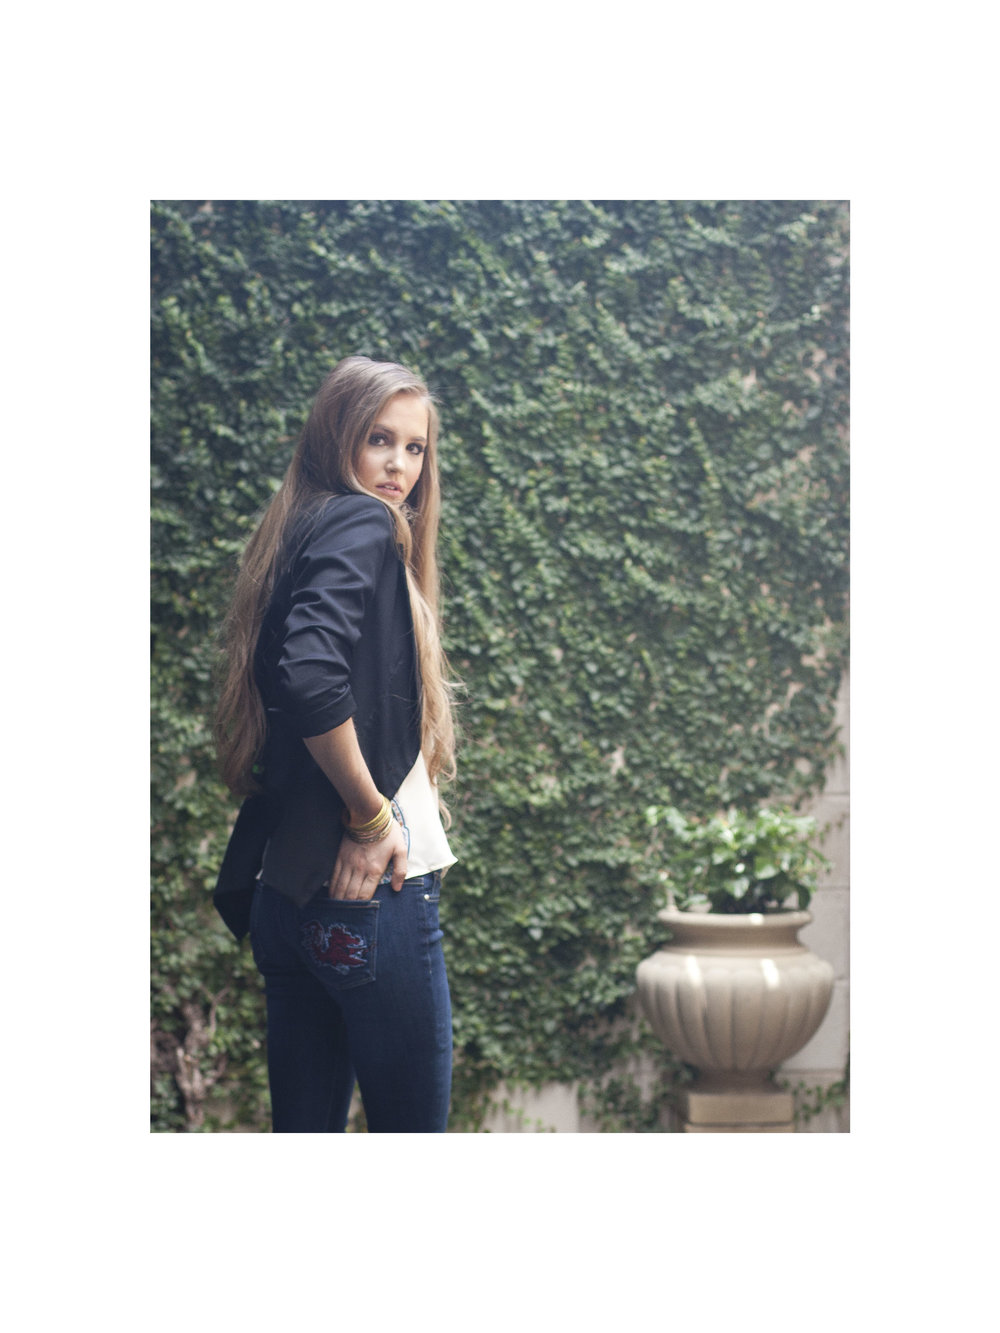 ronaldvillegas-illustration-ocjapparel-photo-jeans.jpg